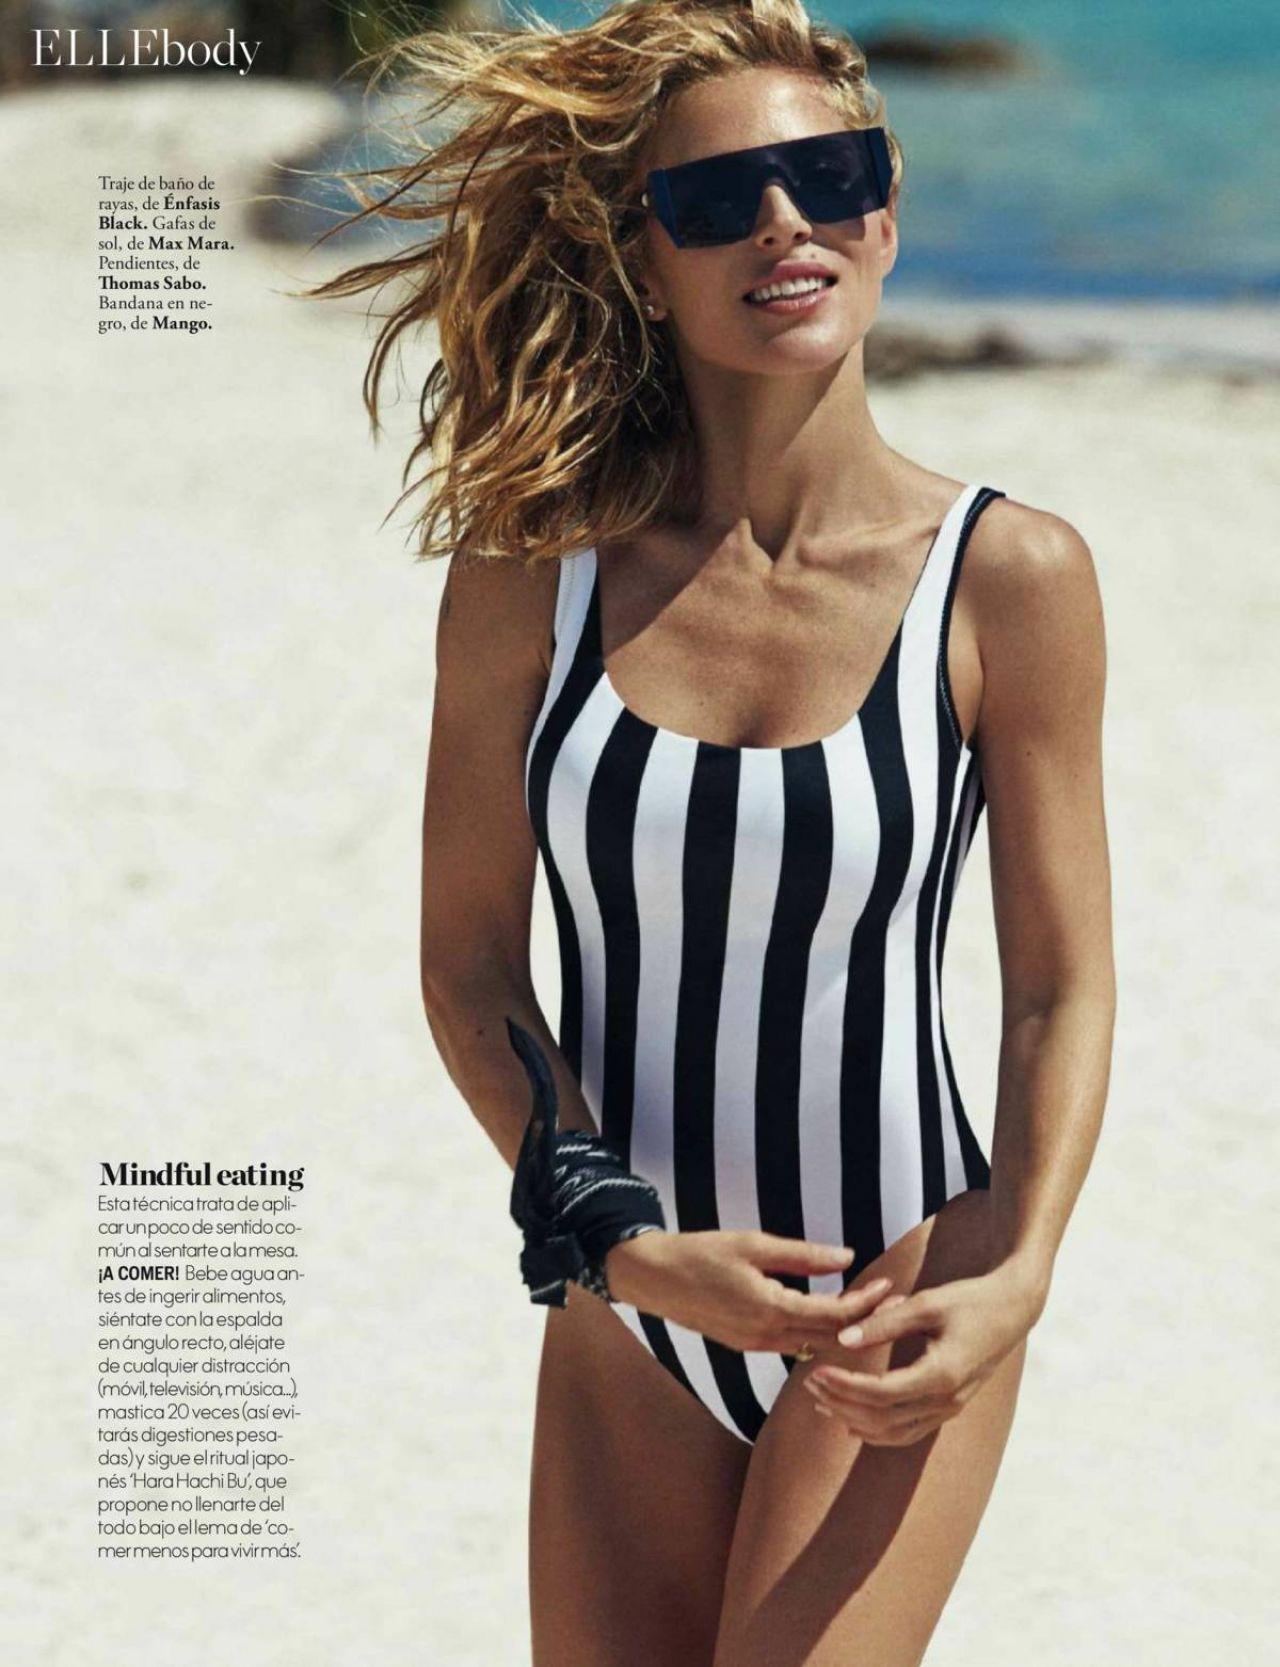 Elsa Pataky Elle Magazine Spain May 2017 Issue